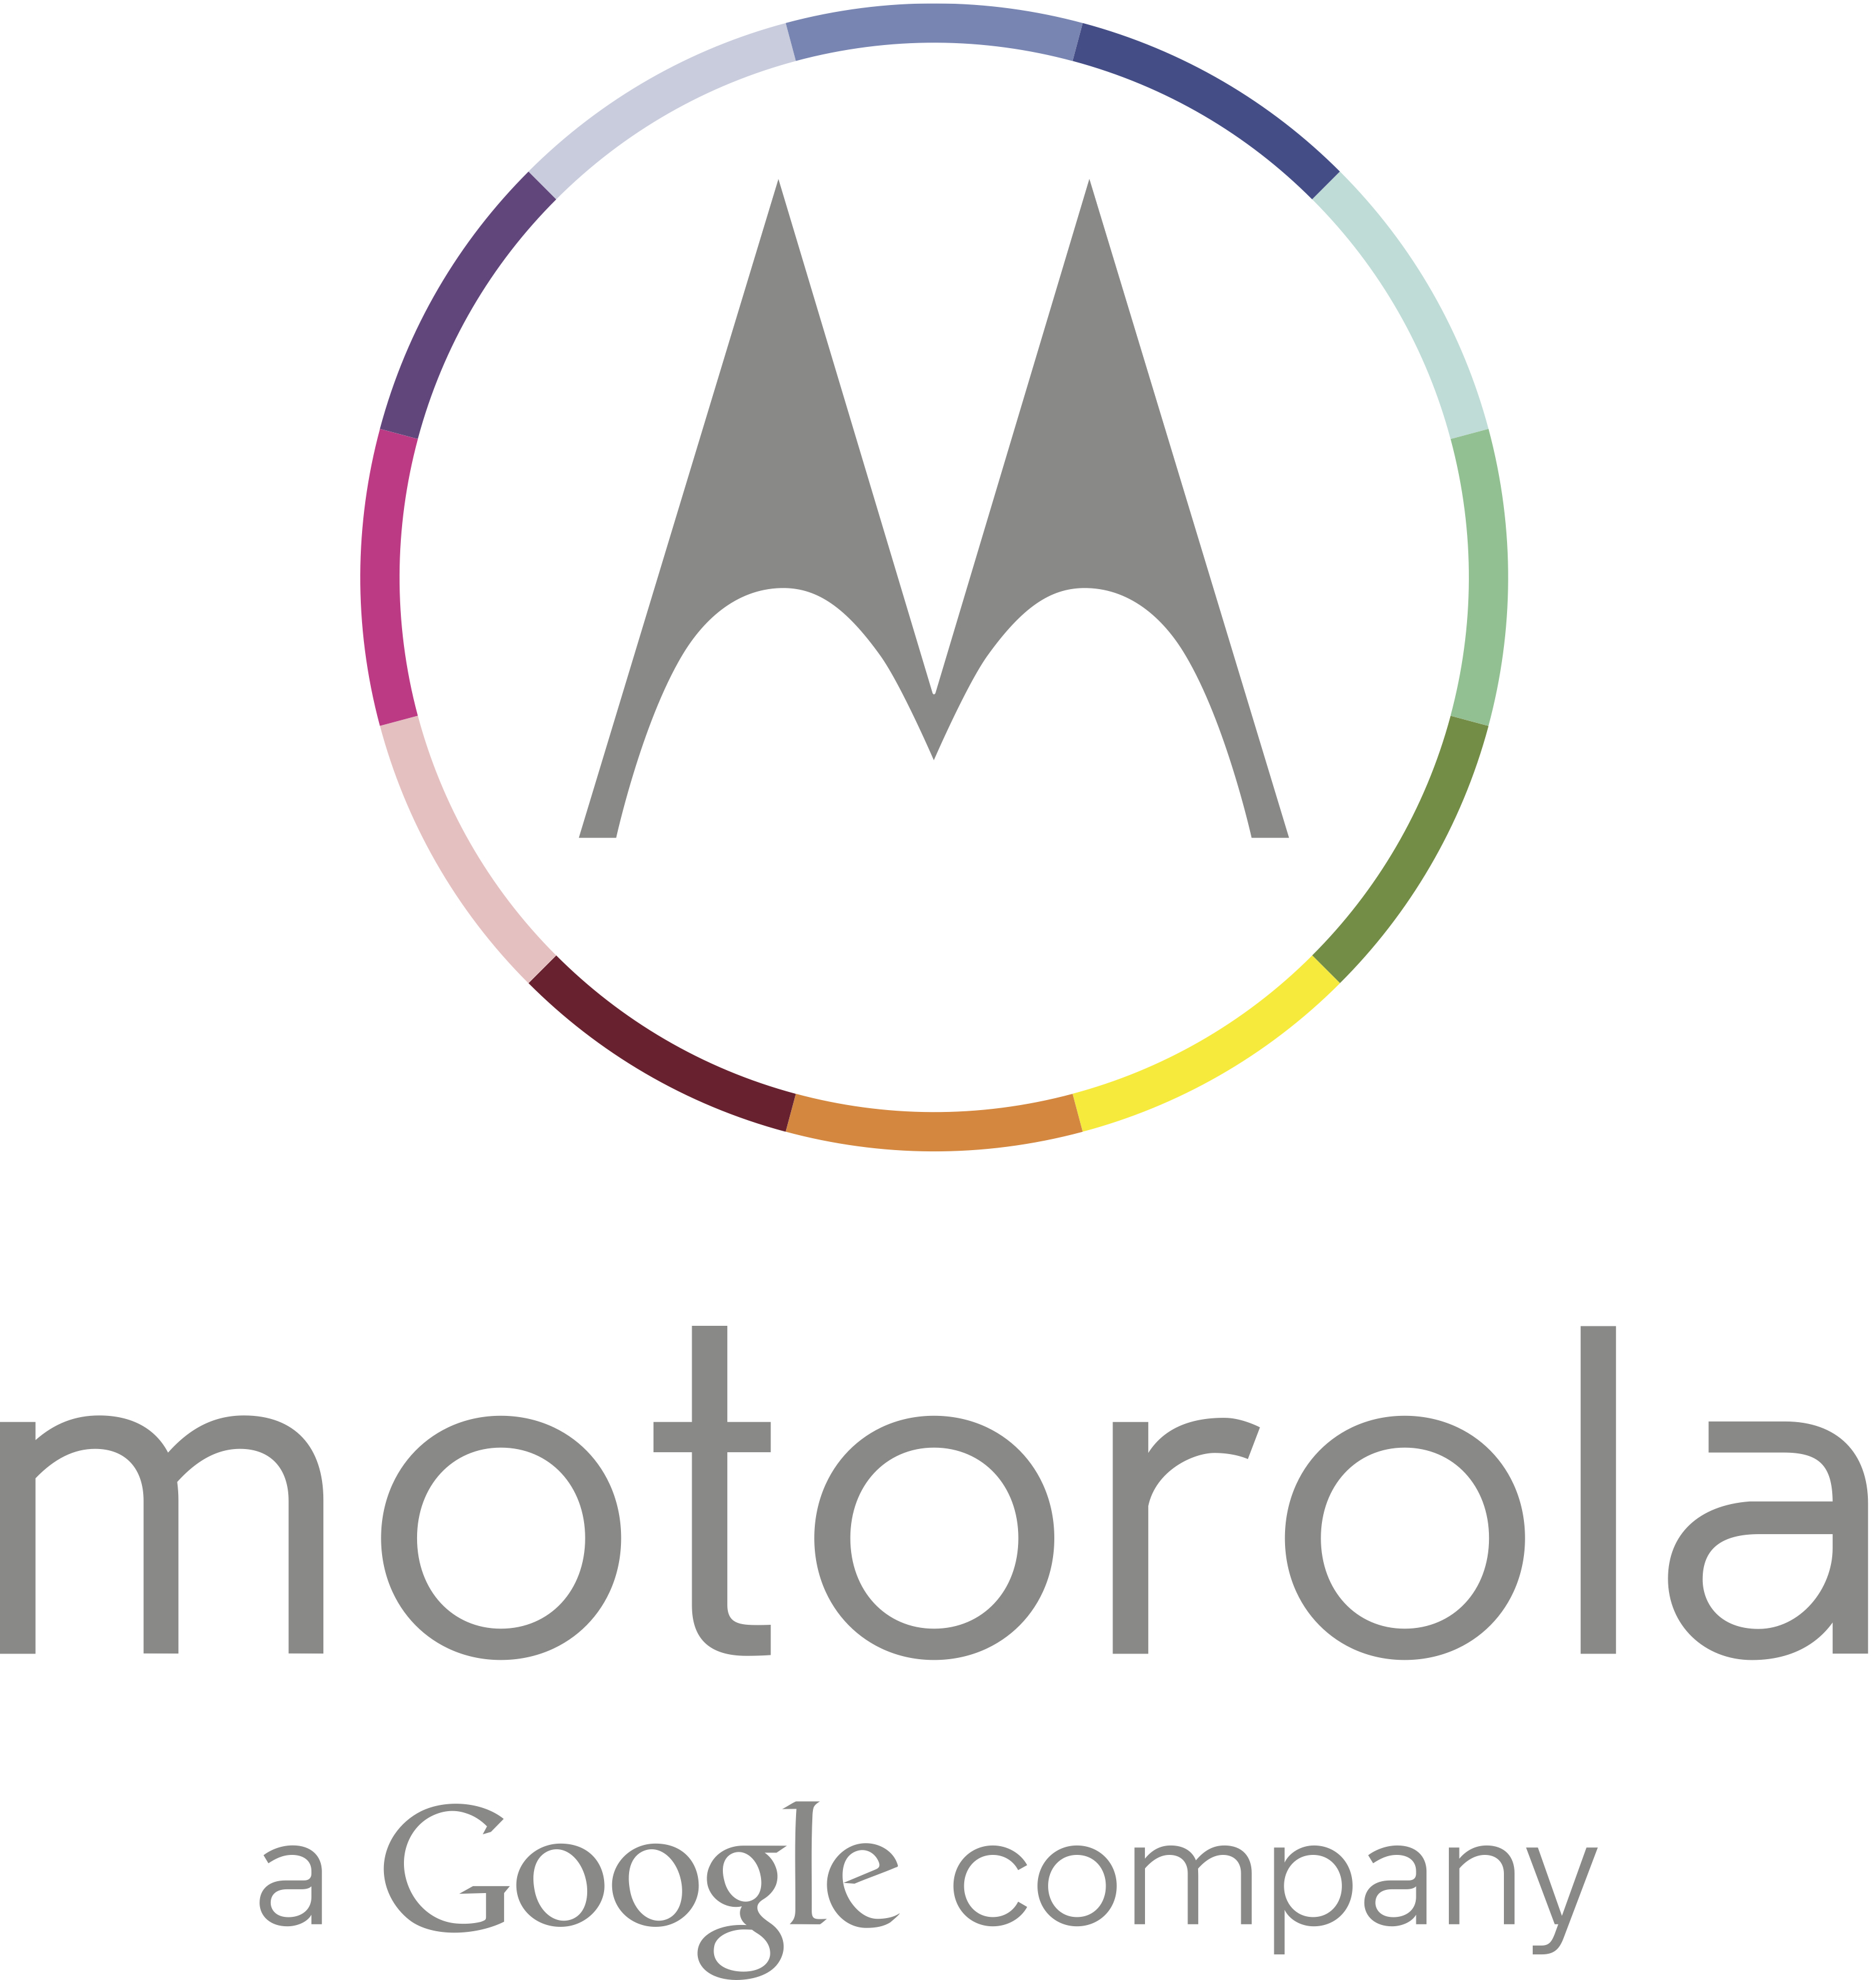 Motorola logo (full size)